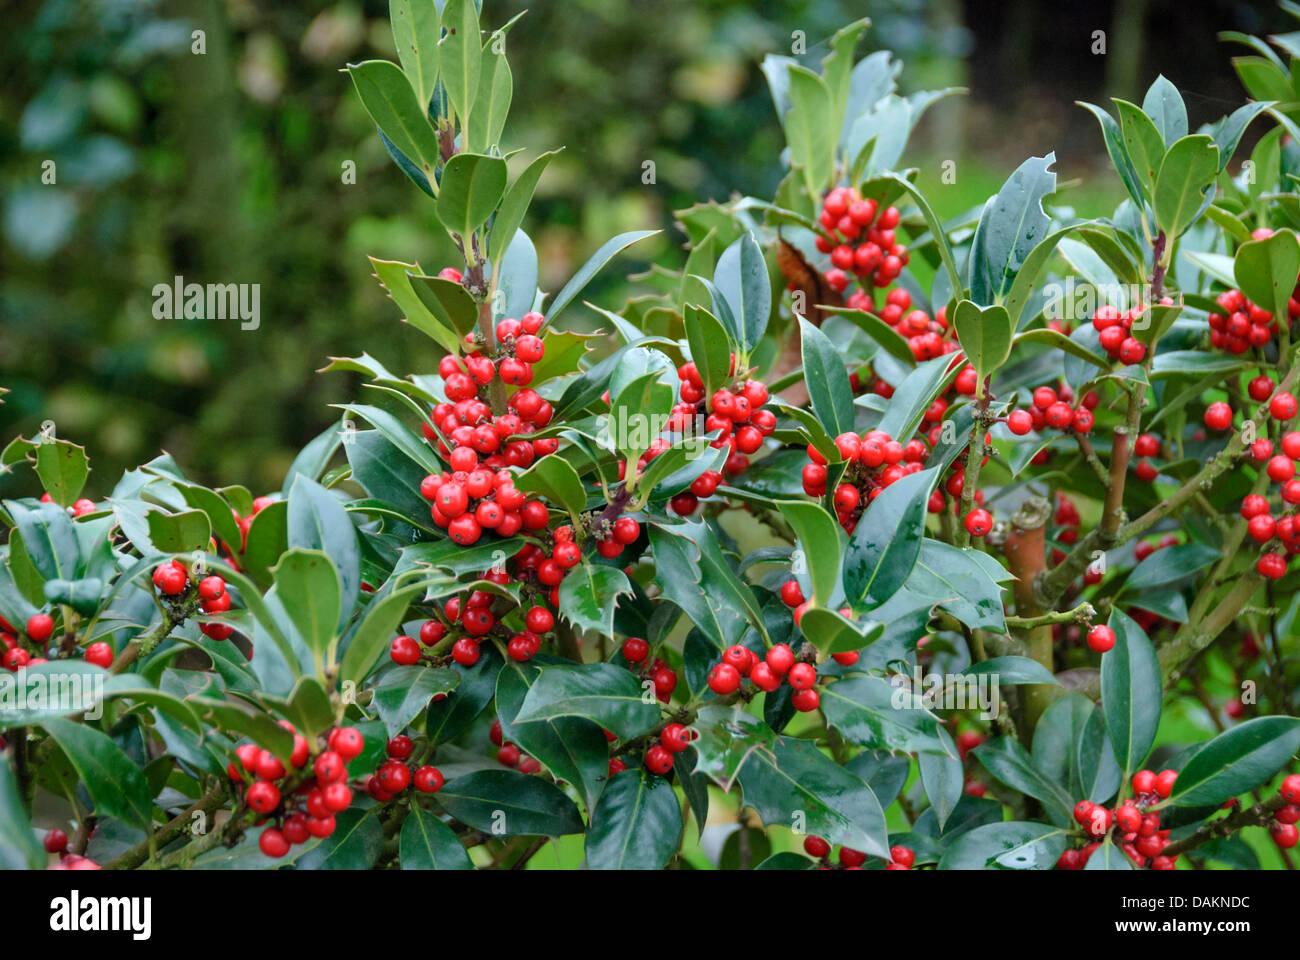 common holly, English holly (Ilex aquifolium 'JC van Tol', Ilex aquifolium JC van Tol), cultivar JC van - Stock Image